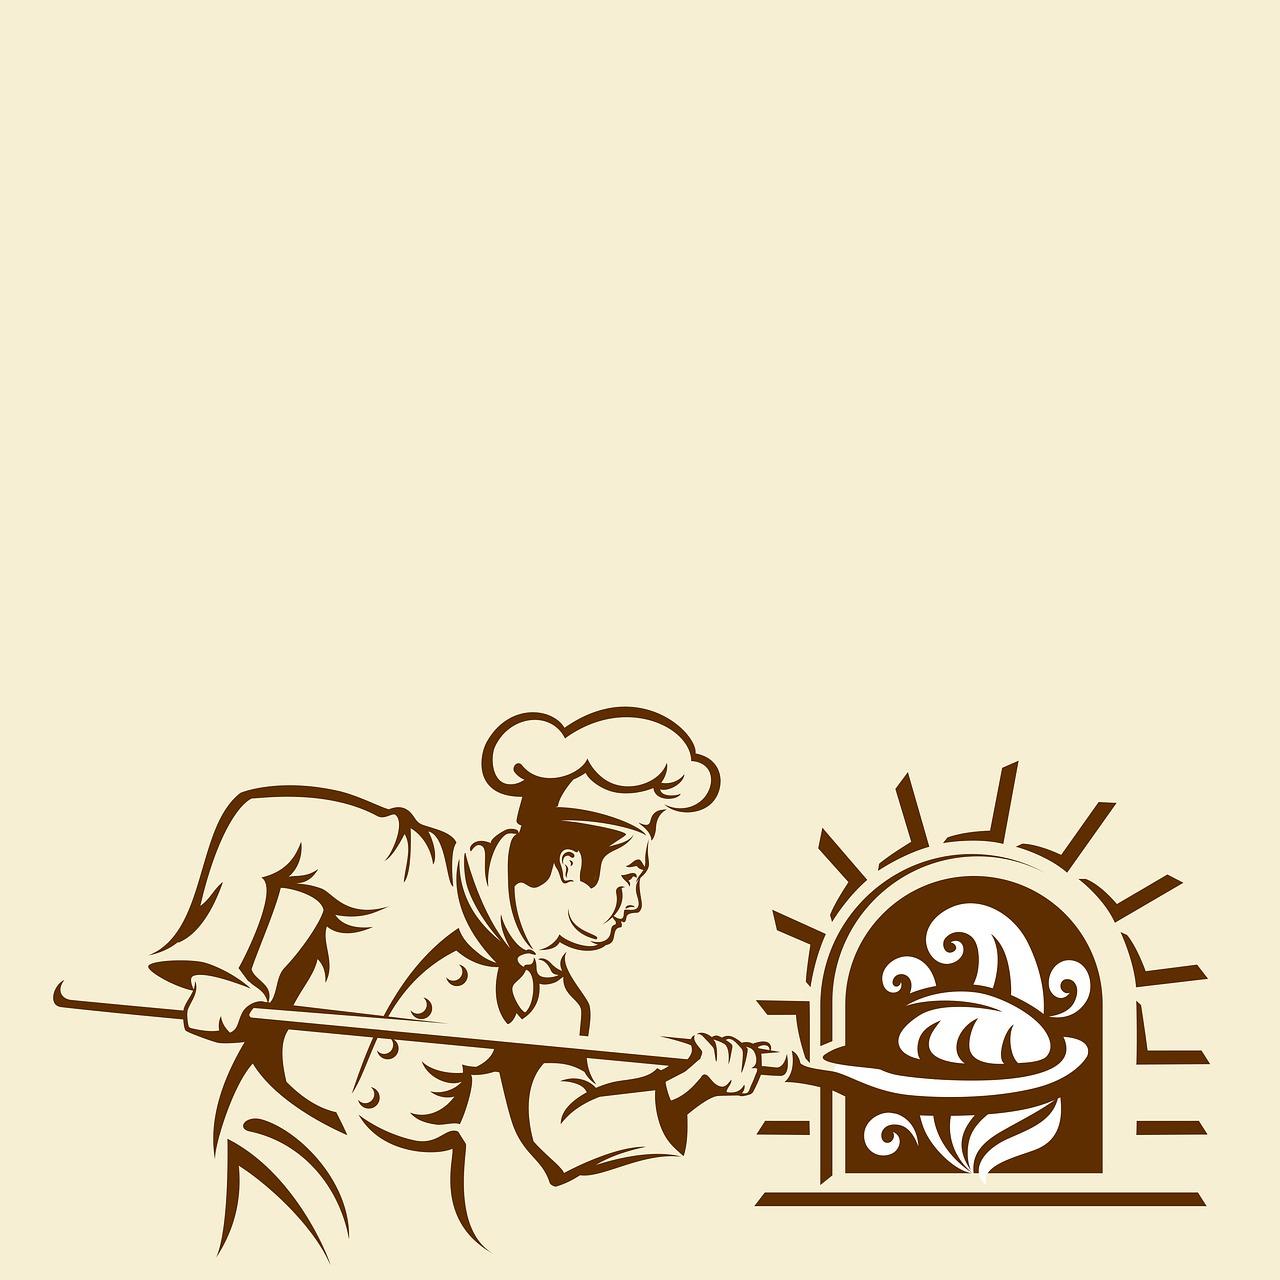 Pizza Oven Menggambar Gambar Gratis Di Pixabay